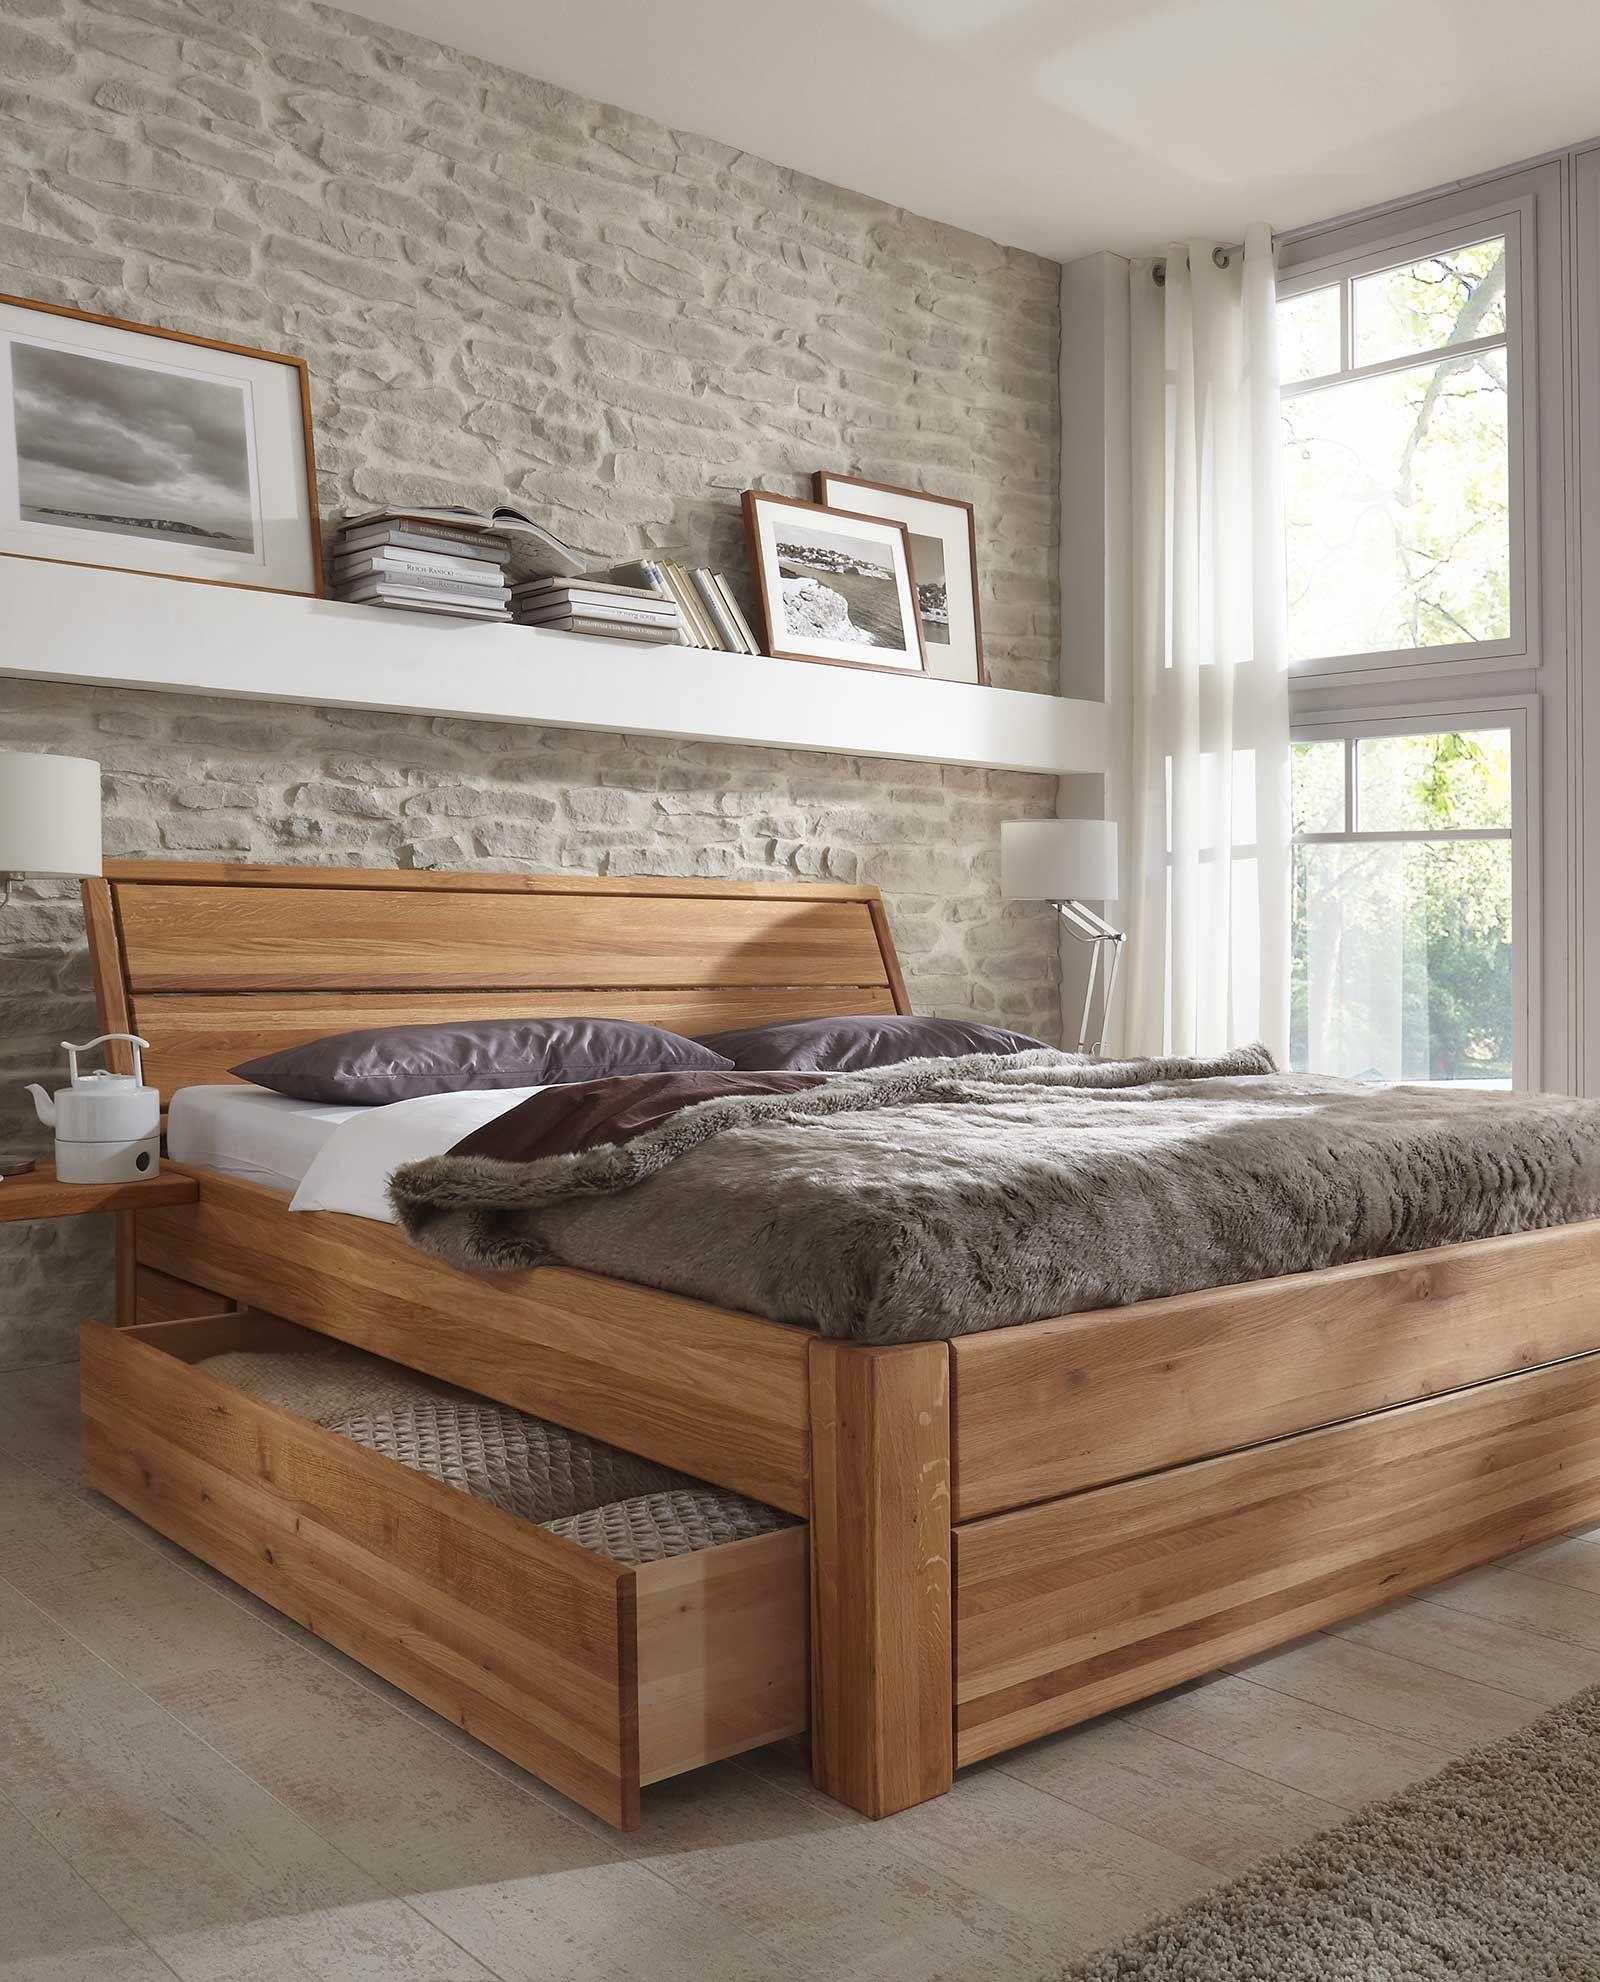 Seng Med Skuff Plataform Bed Decoracao De Casa Rustica Cabeceira De Cama Casal